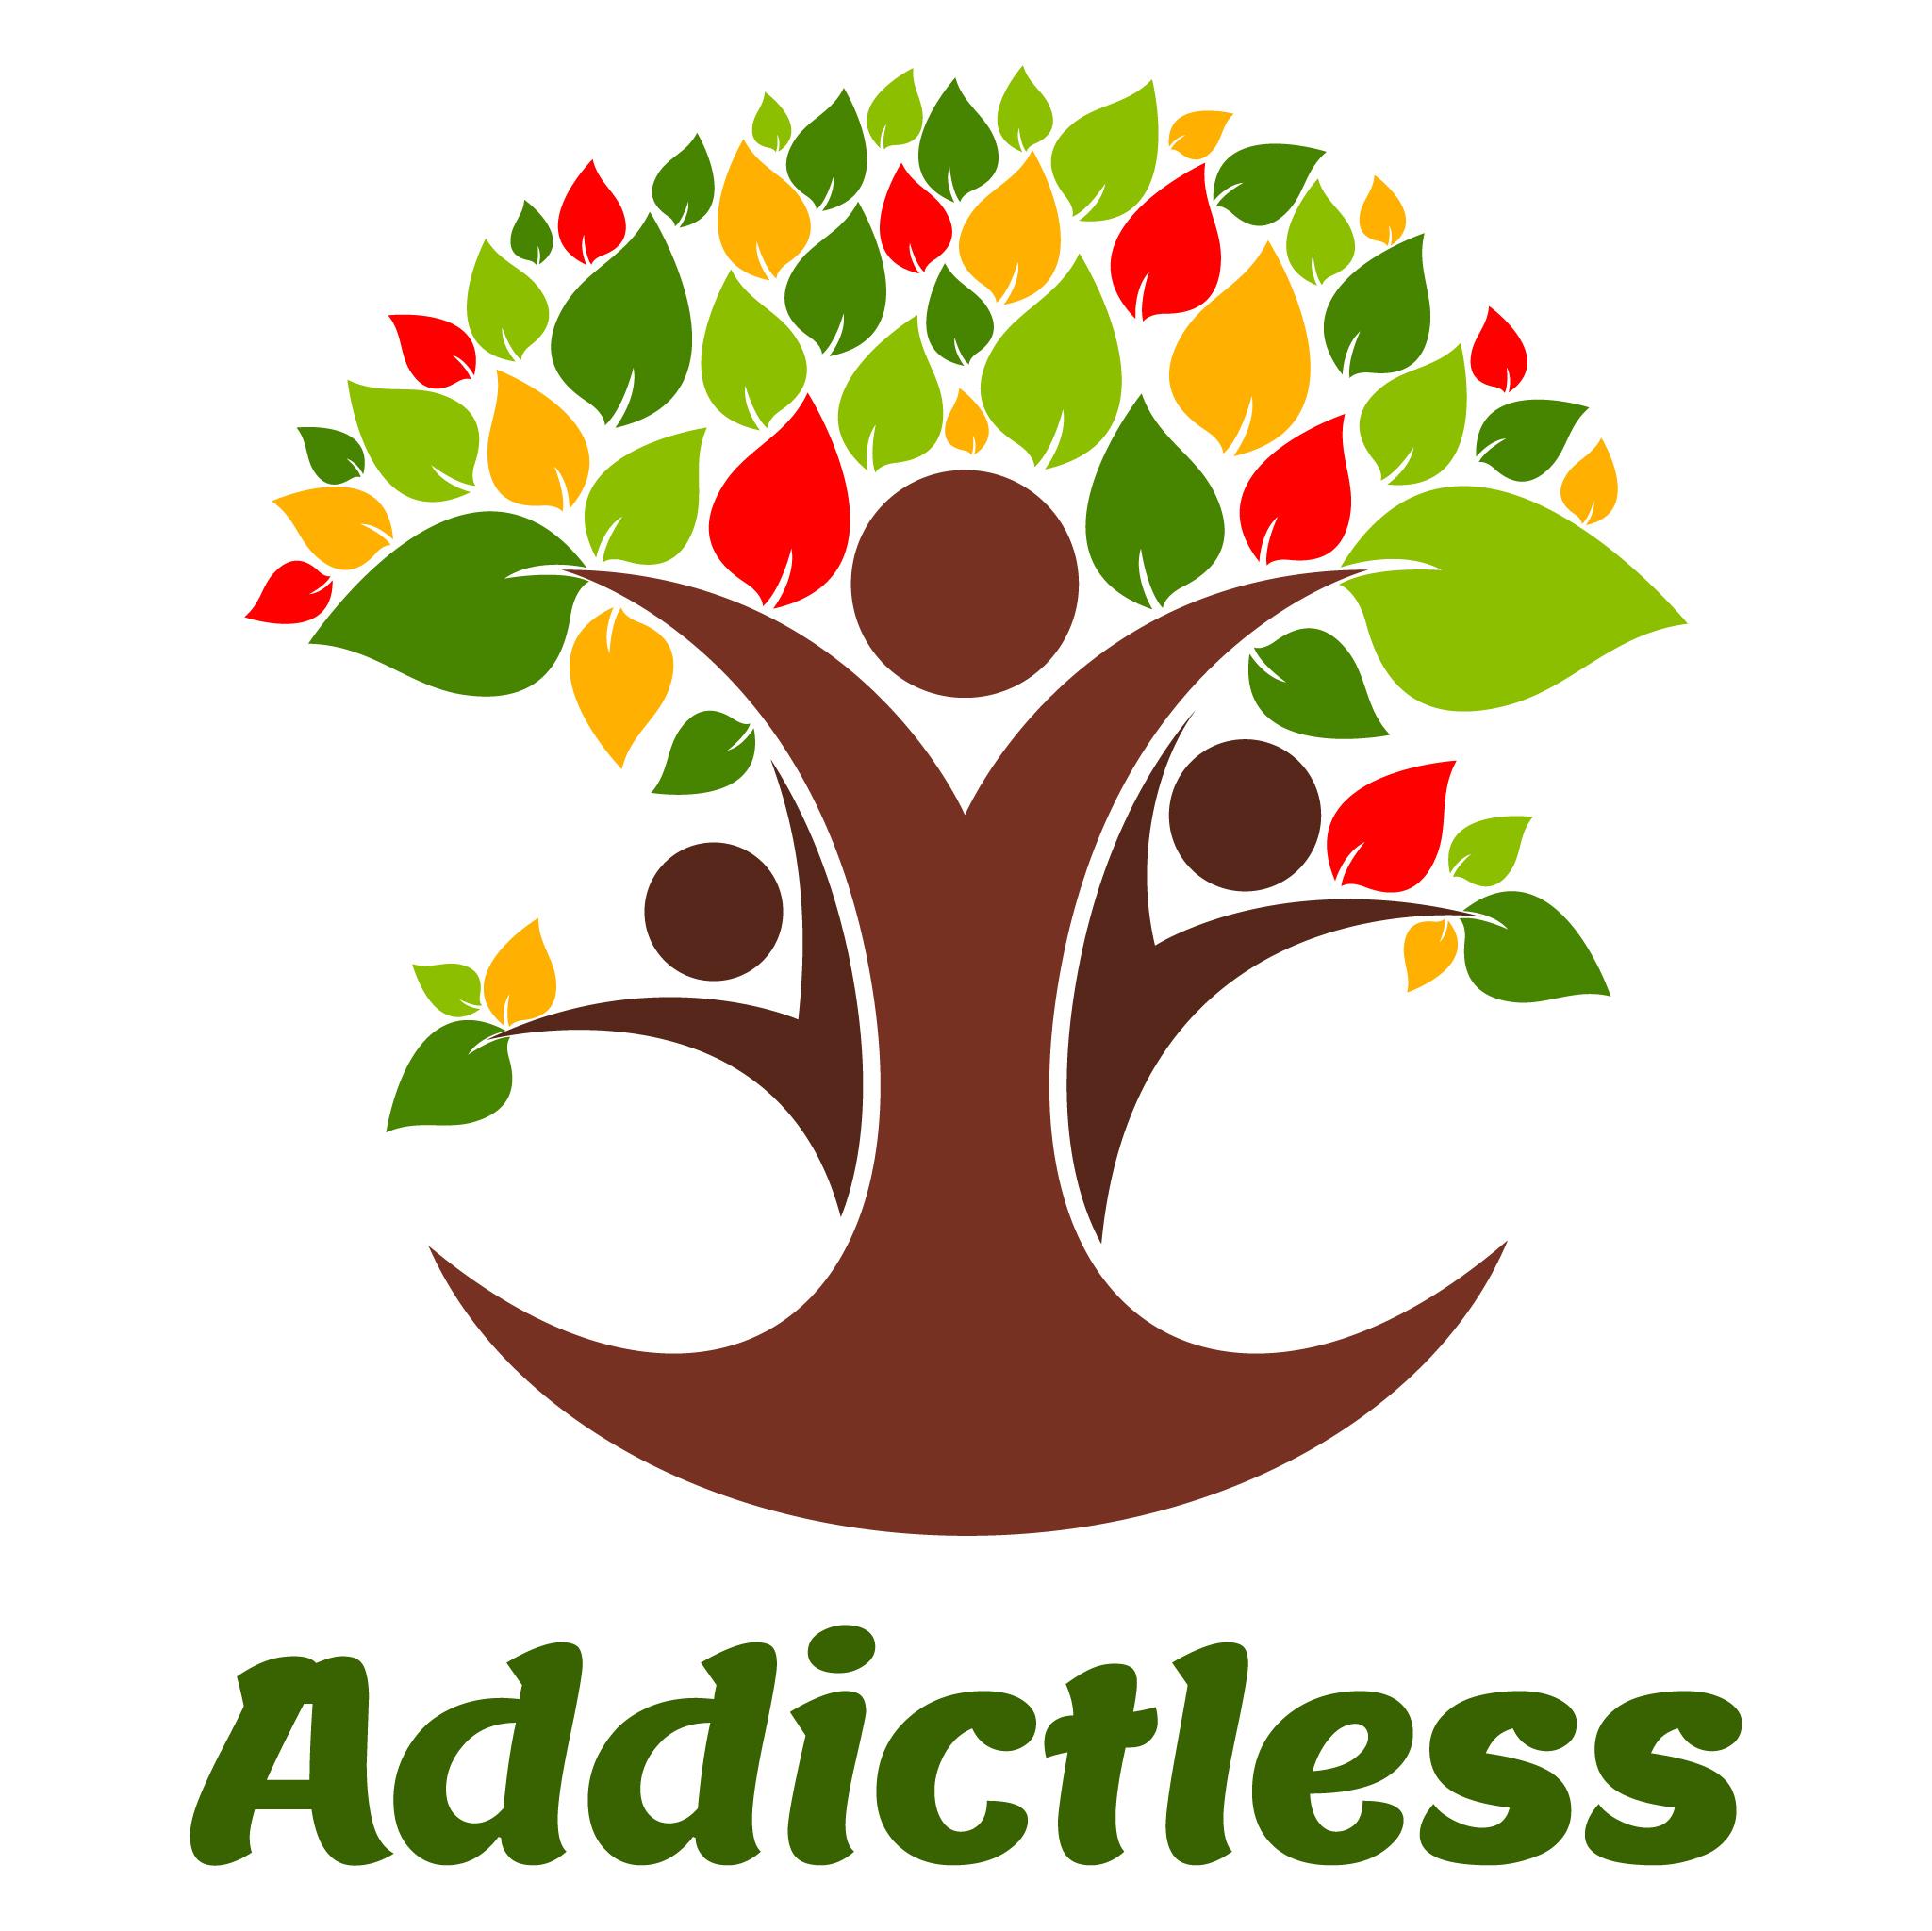 Asociaţia Addictless Suceava logo